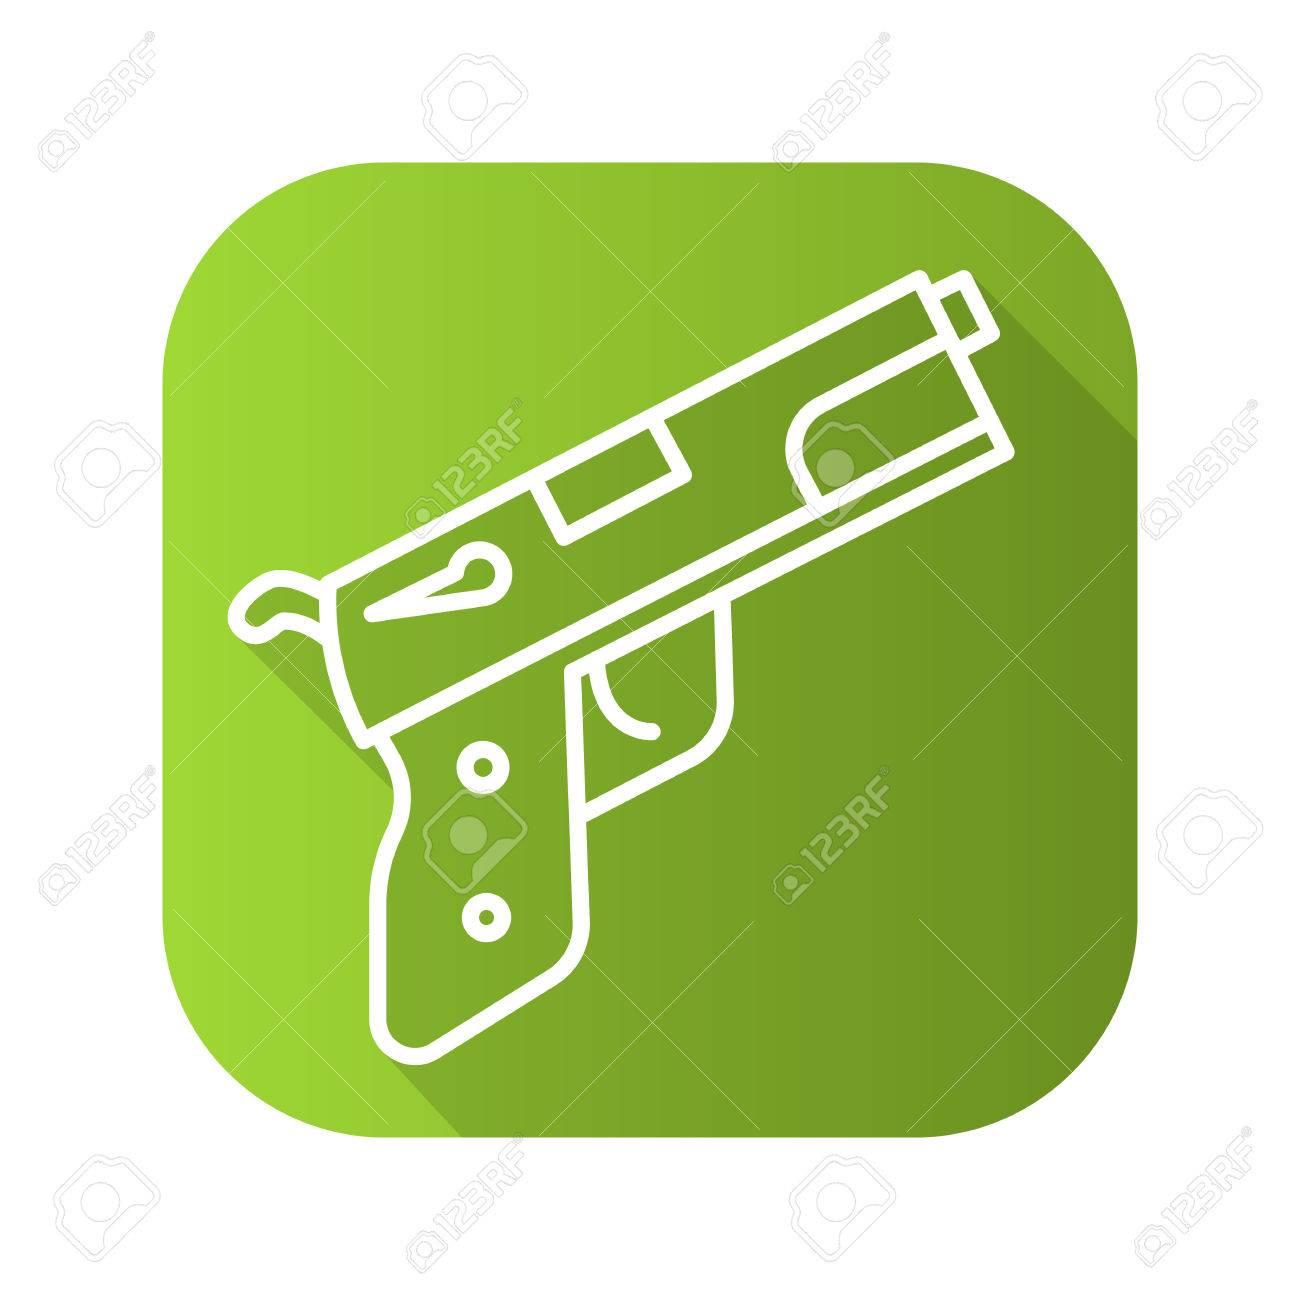 Gun flat linear long shadow icon line symbol royalty free gun flat linear long shadow icon line symbol stock vector 68349577 biocorpaavc